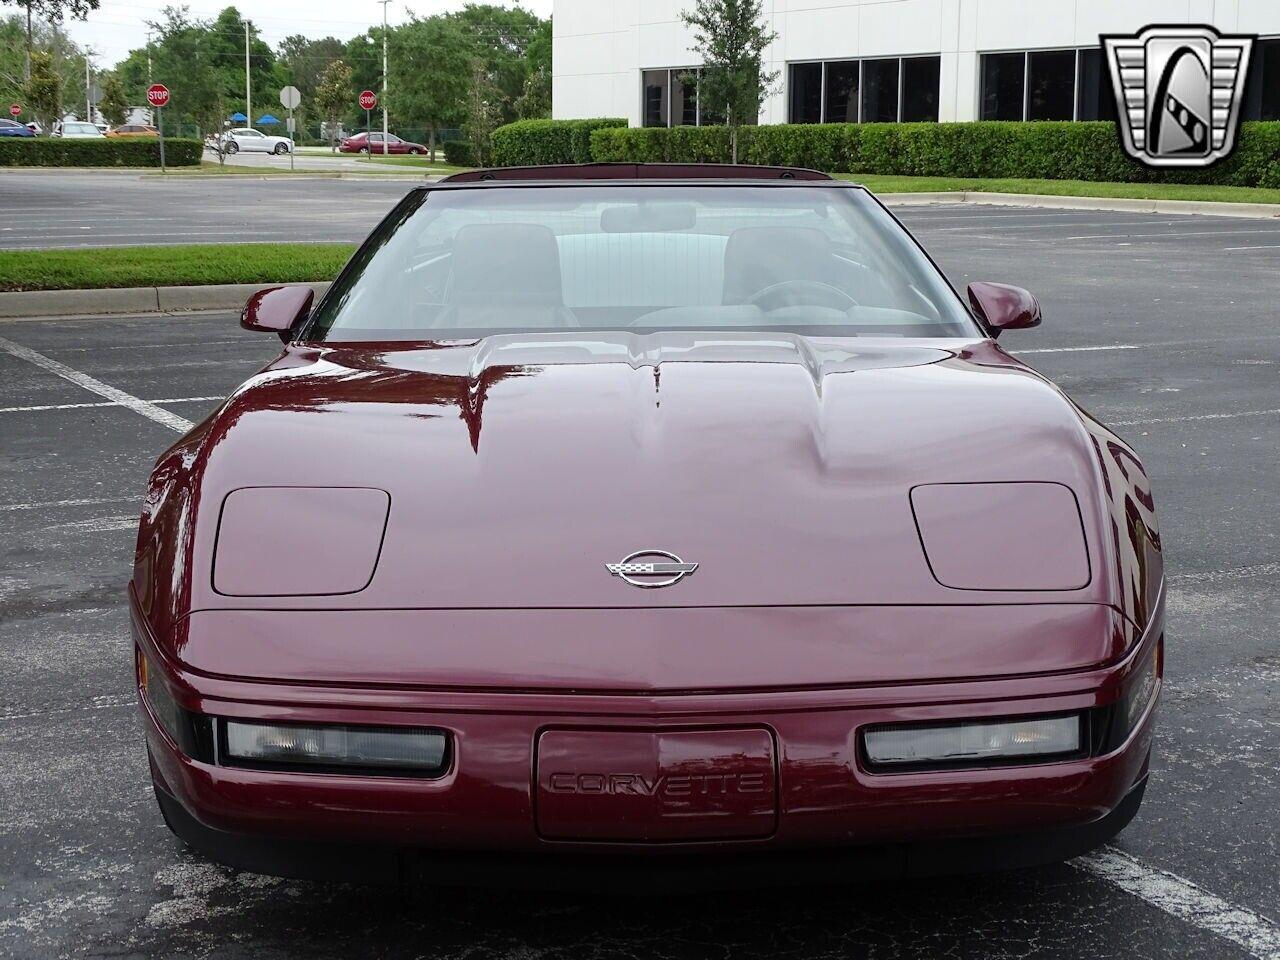 1993 Red Chevrolet Corvette     C4 Corvette Photo 3